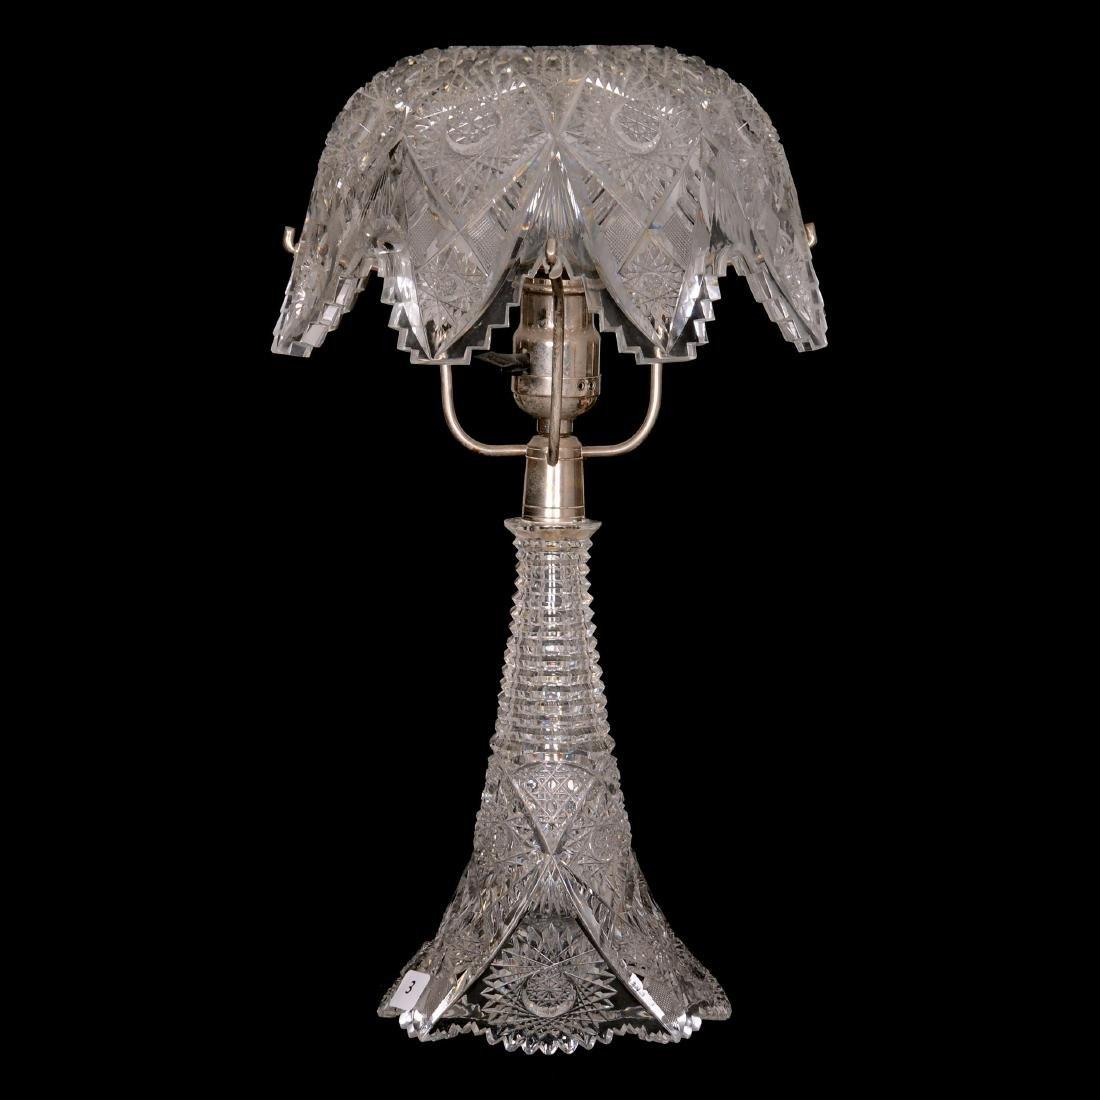 Lamp - ABCG